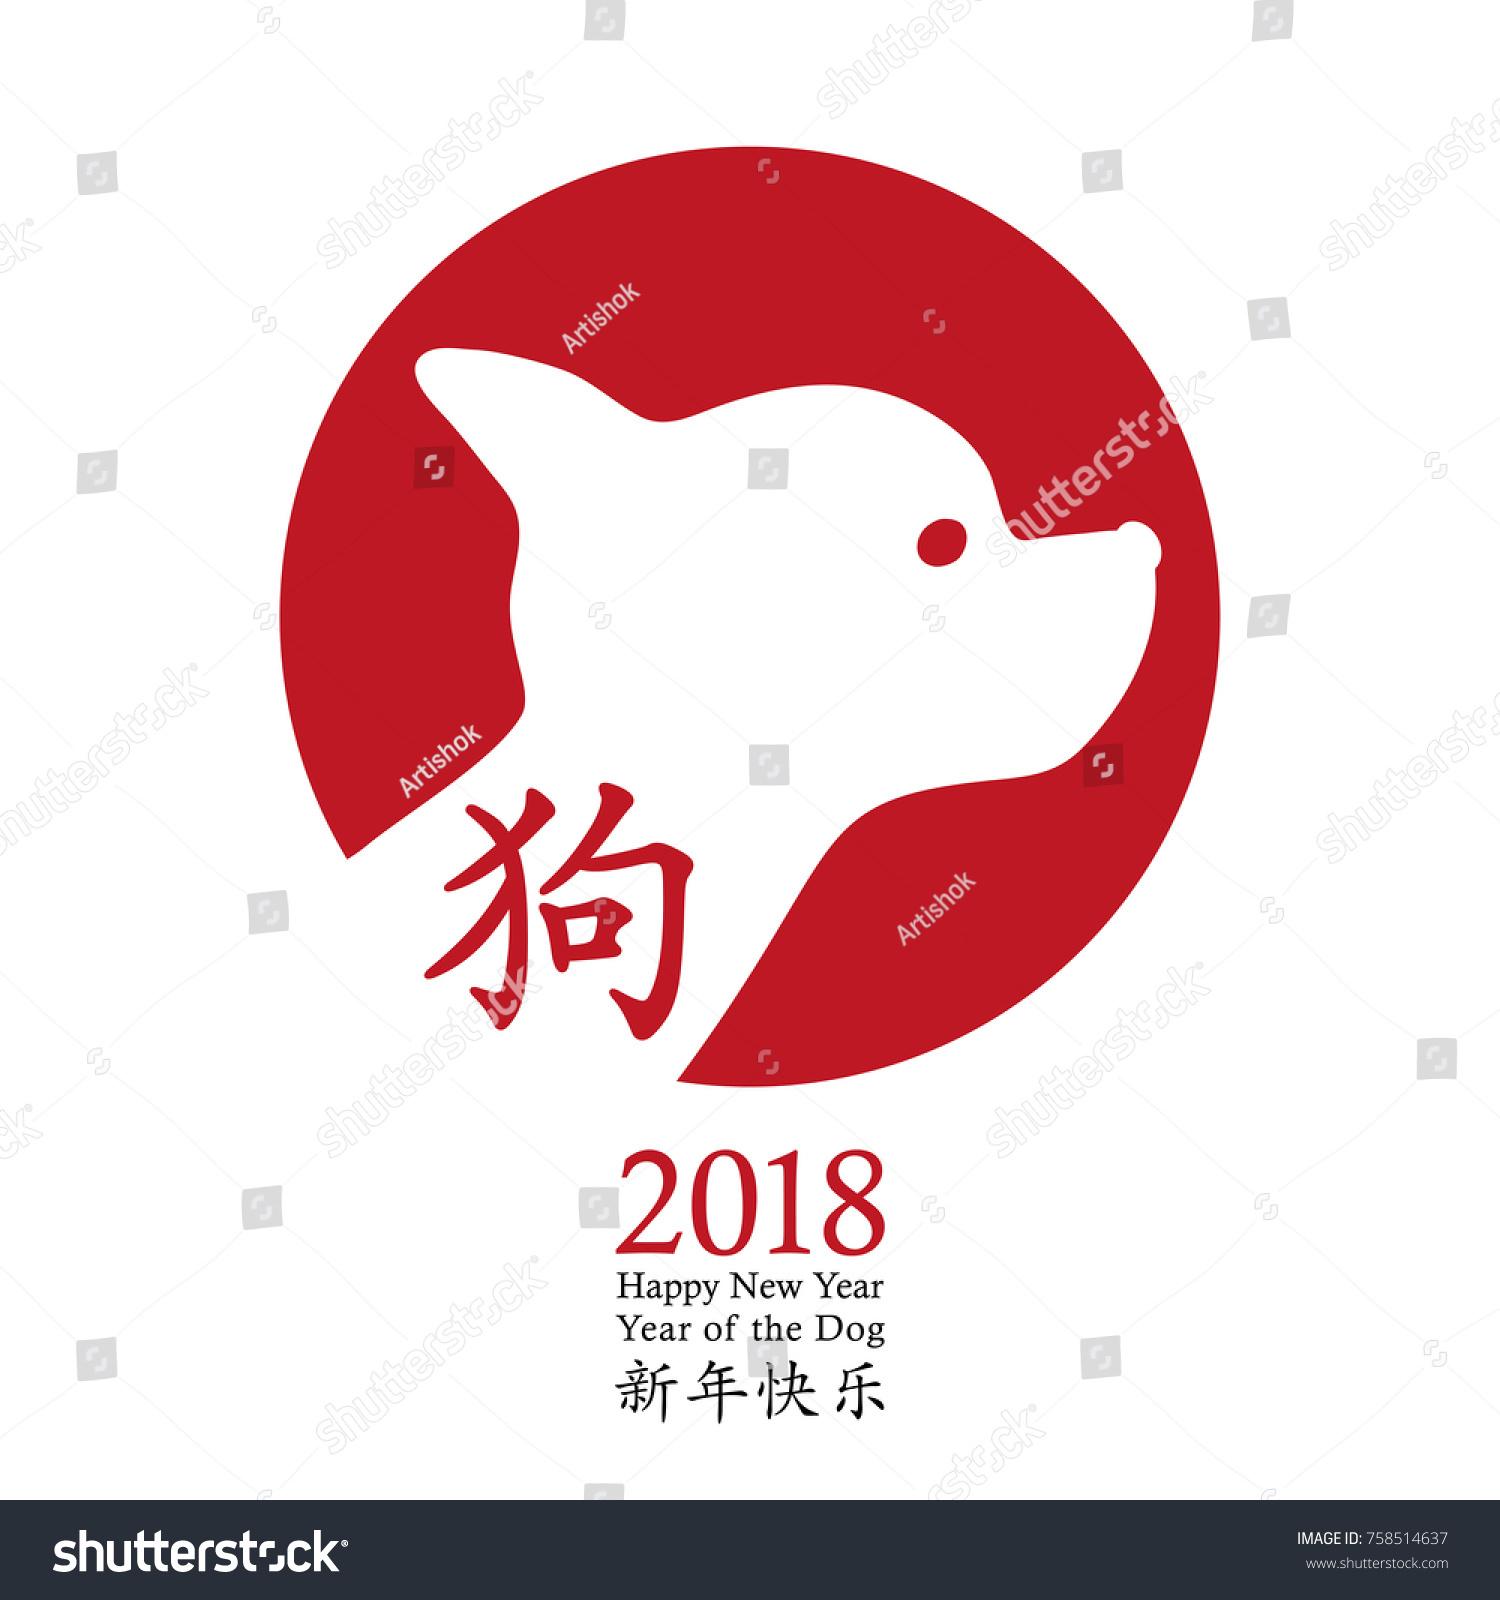 2018 Chinese New Year Dog Vector Stock-Vektorgrafik (Lizenzfrei ...